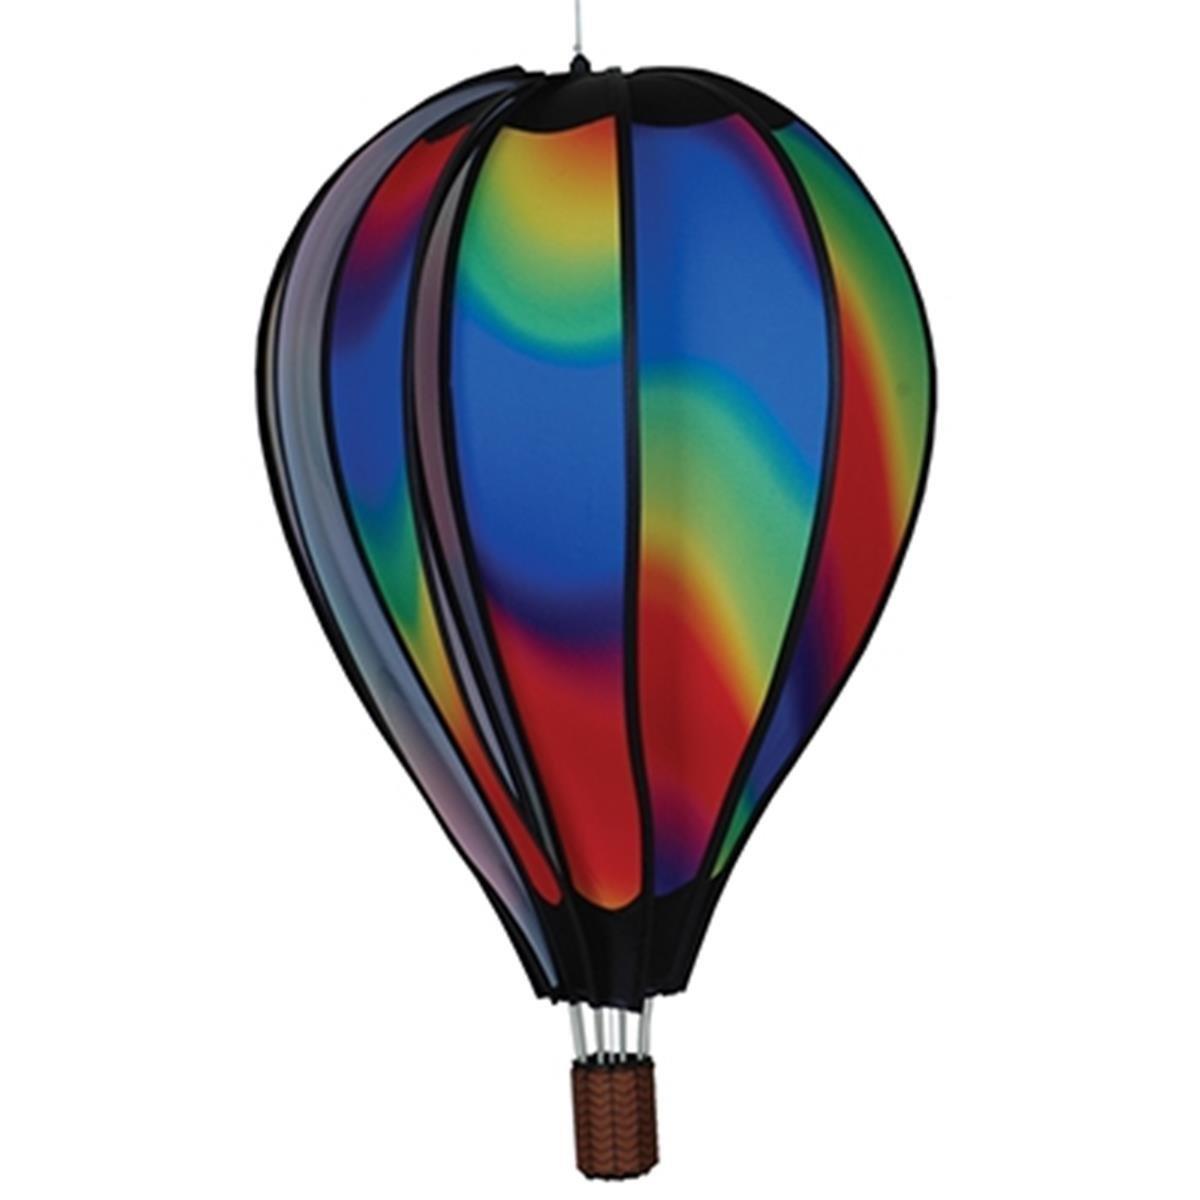 Premier Designs PD25772 Hot Air Balloon Wavy 22 inch B000UDAL7O